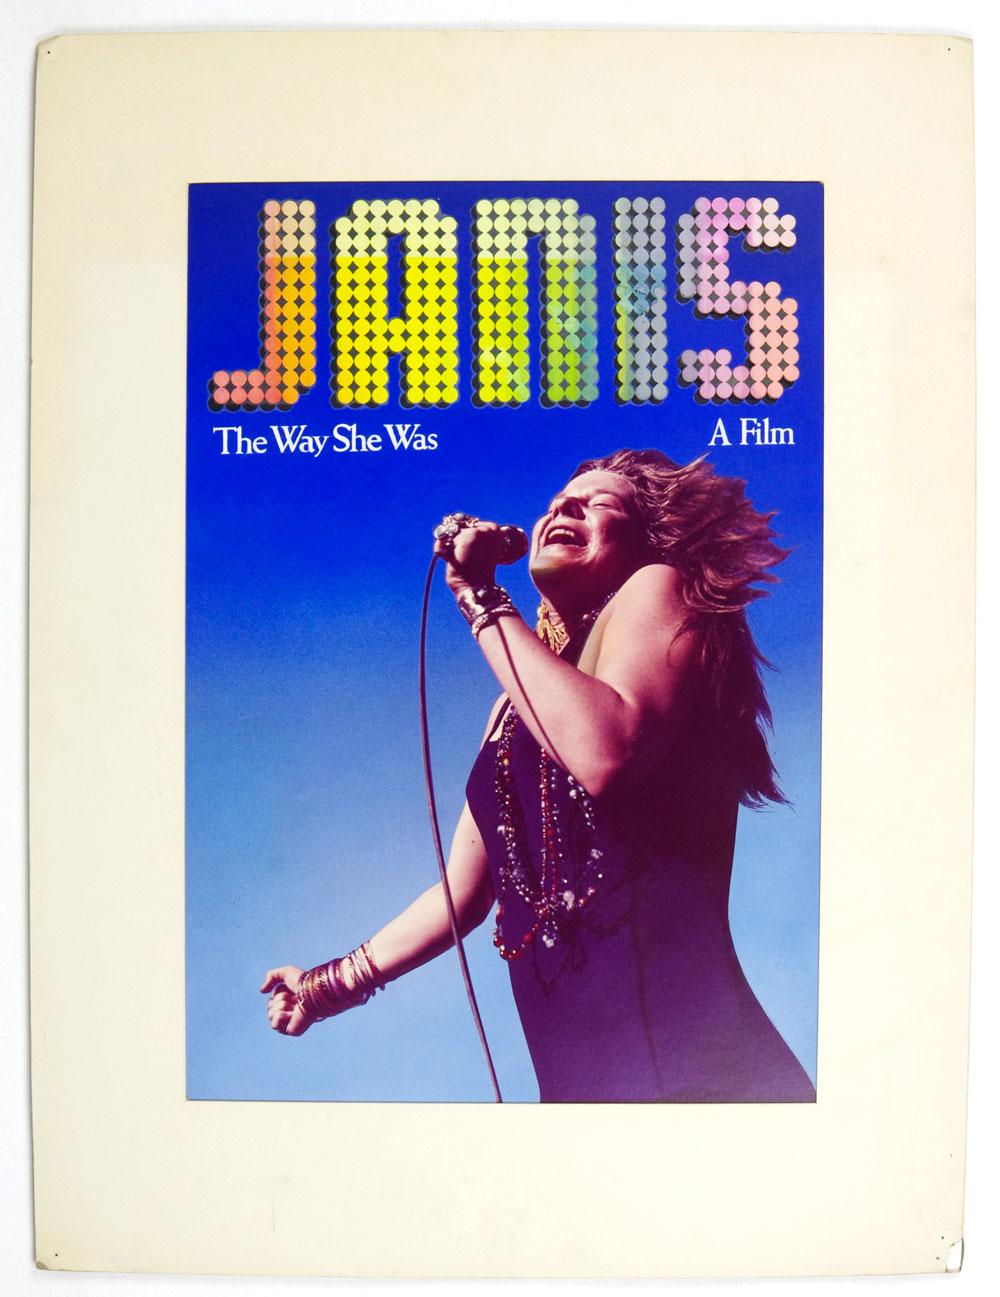 Janis Joplin Poster The Way She Was 1974 Movie Alternative version 18 x 12.5